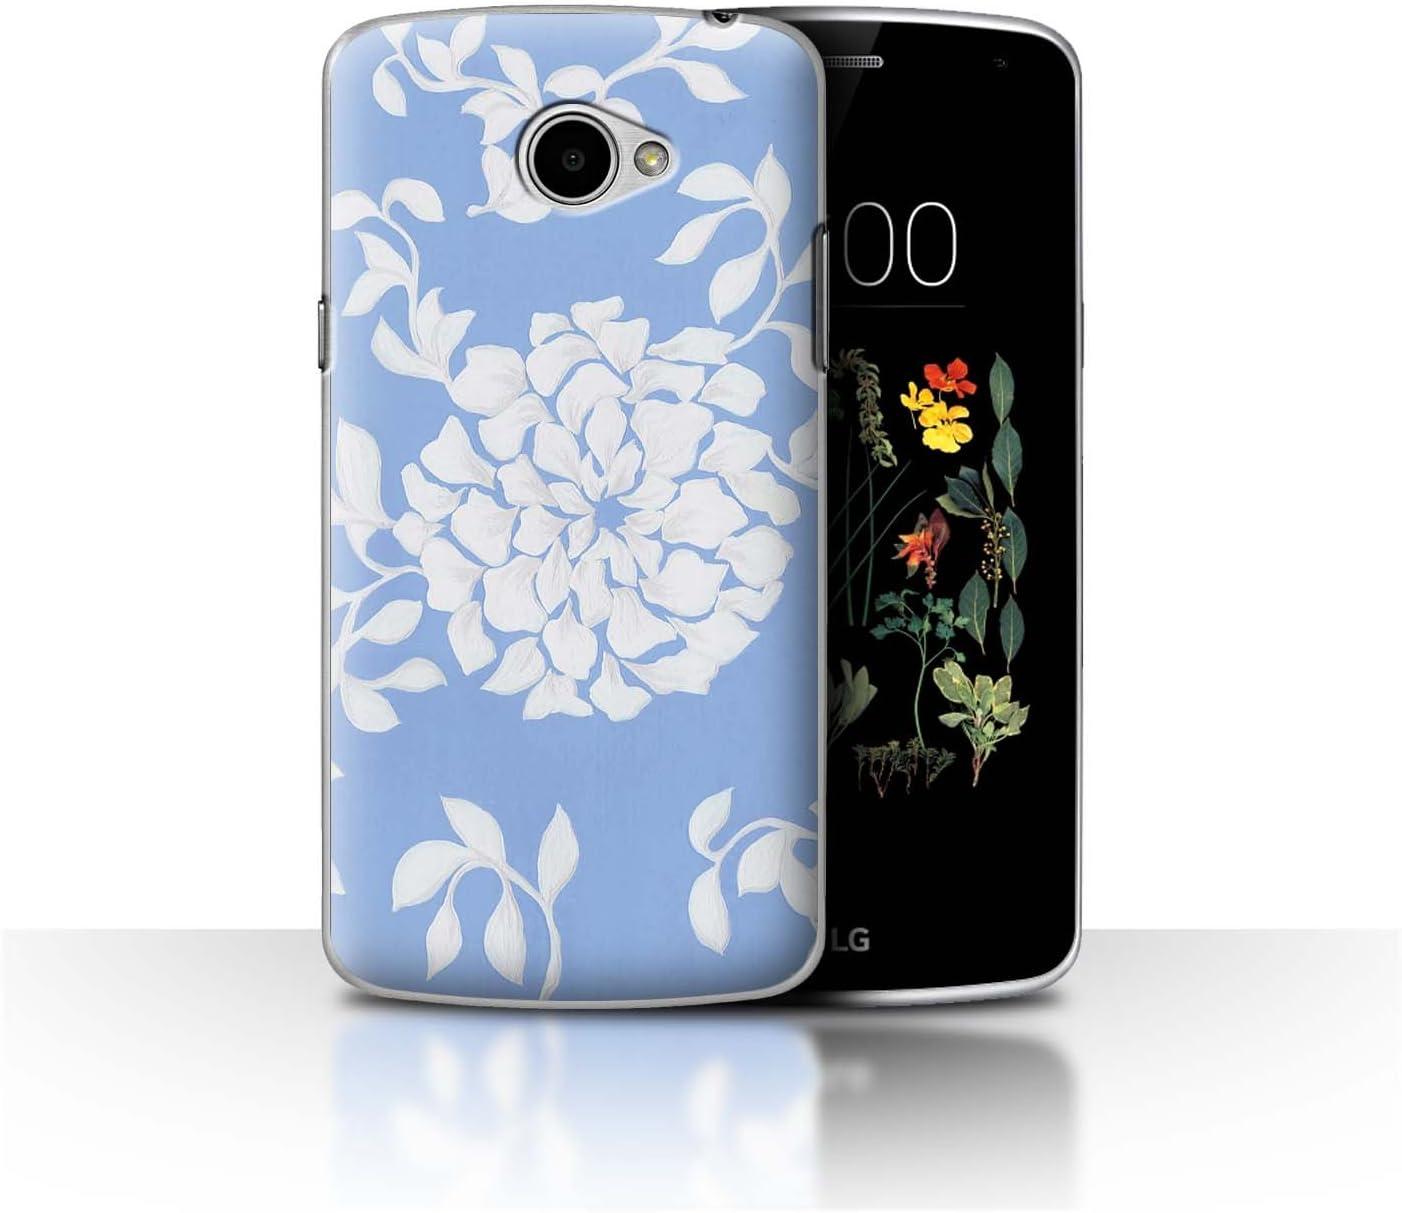 Stuff4® Phone Case/Cover/Skin/LG-CC/bluefshn Collection Fiore ...